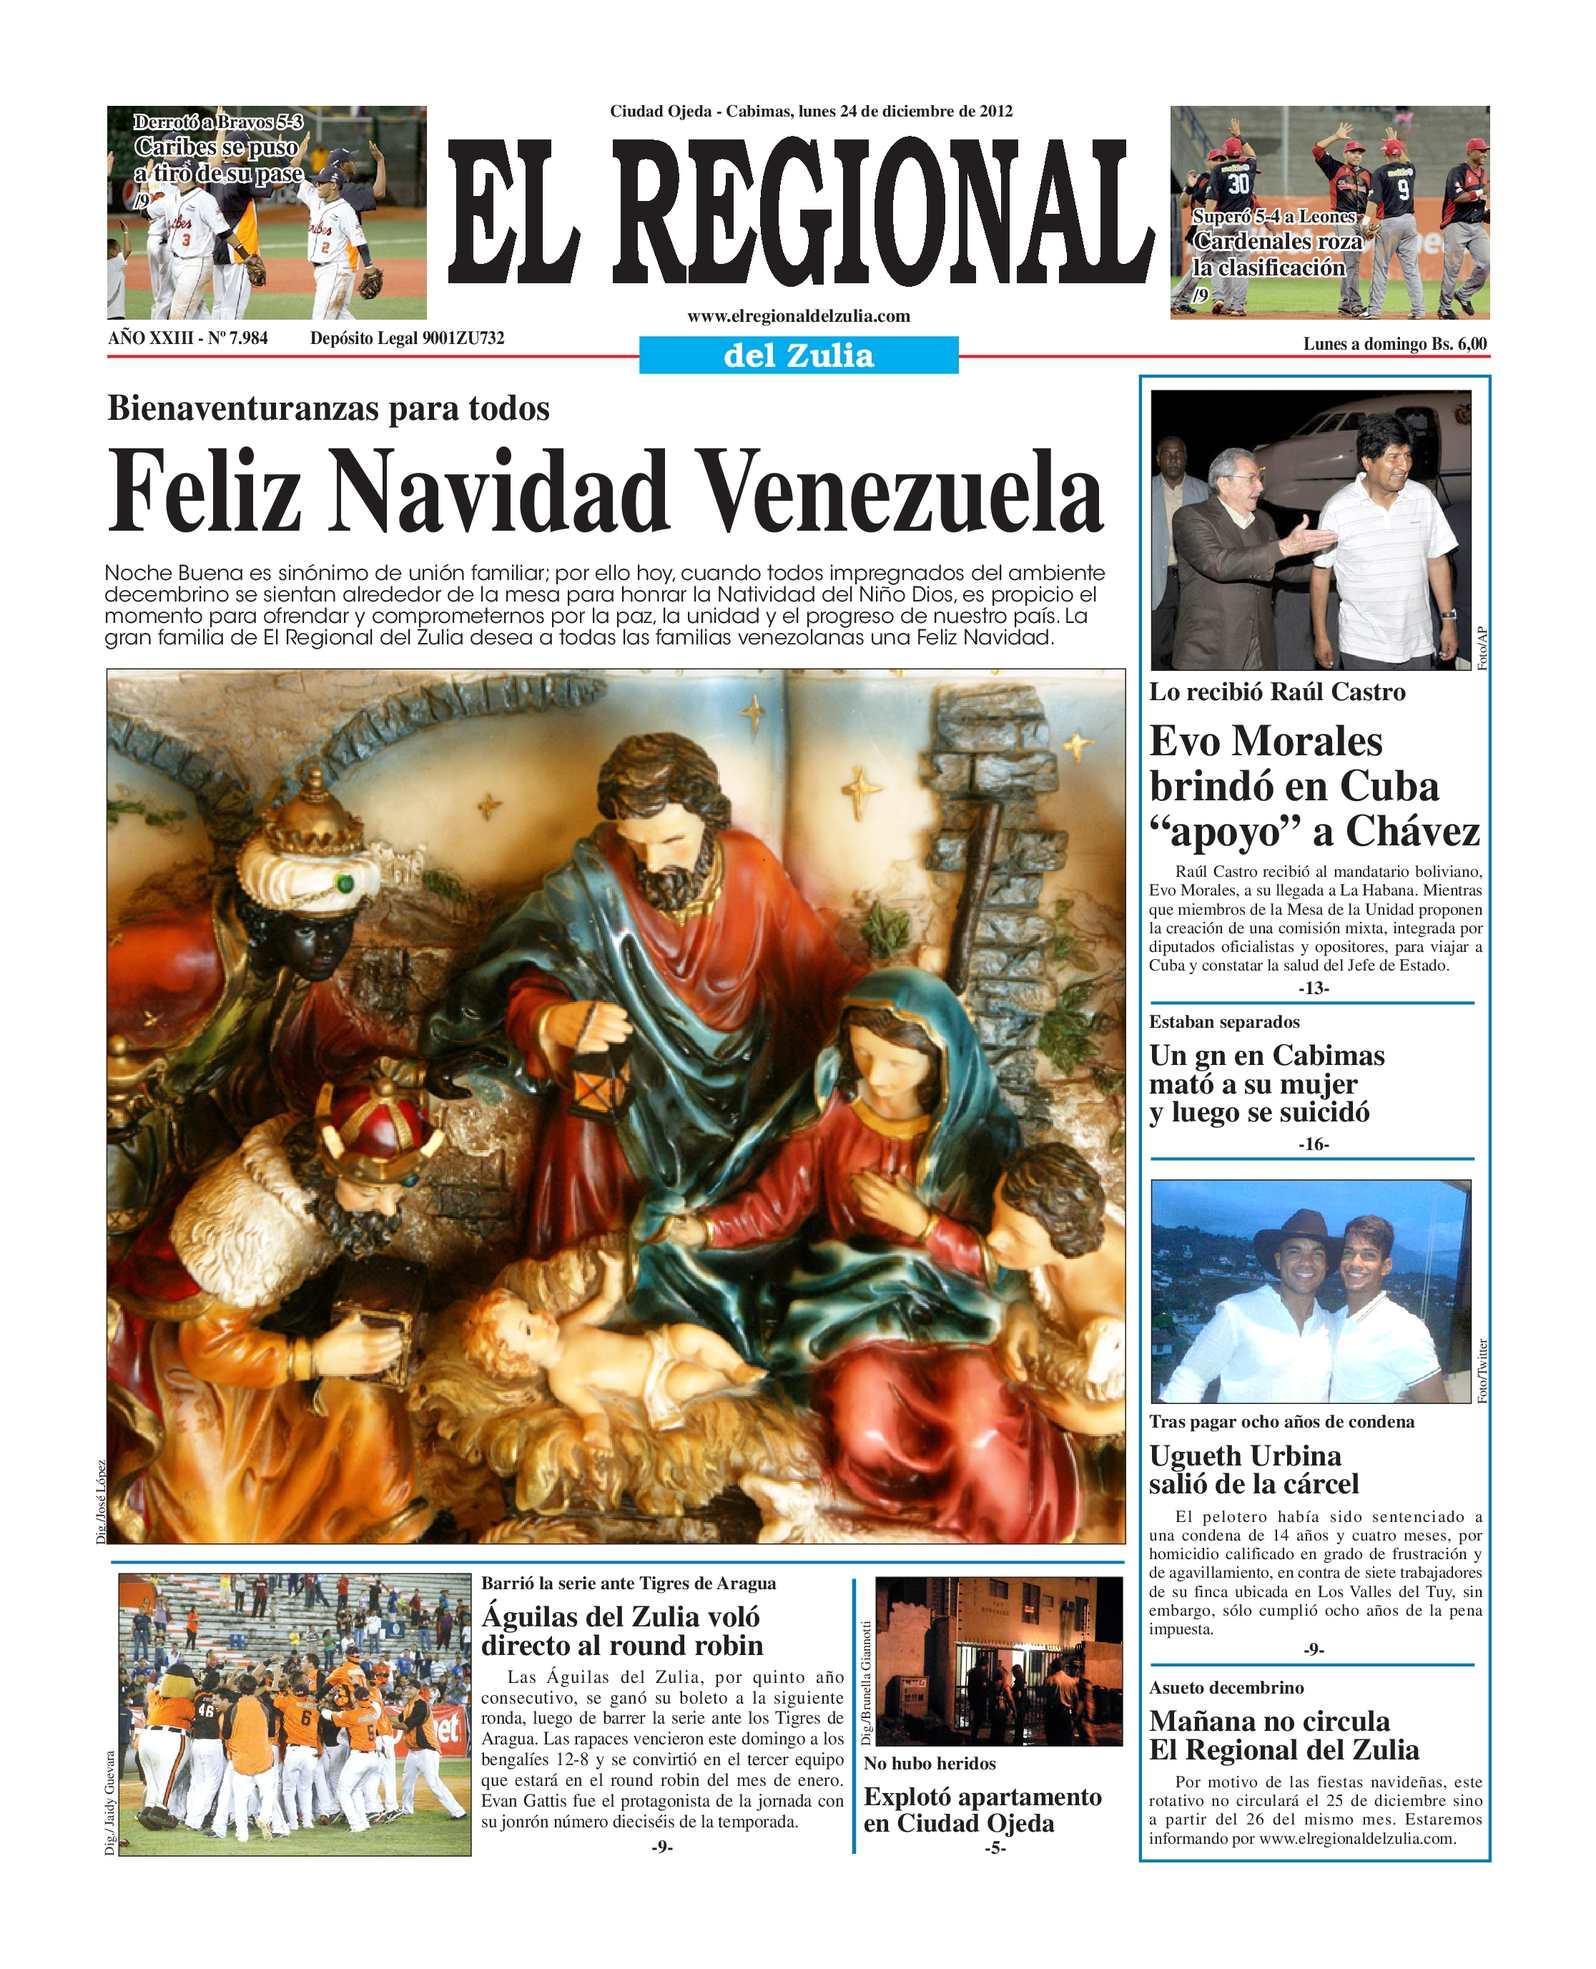 Calaméo - El Regional del Zulia 24-12-2012